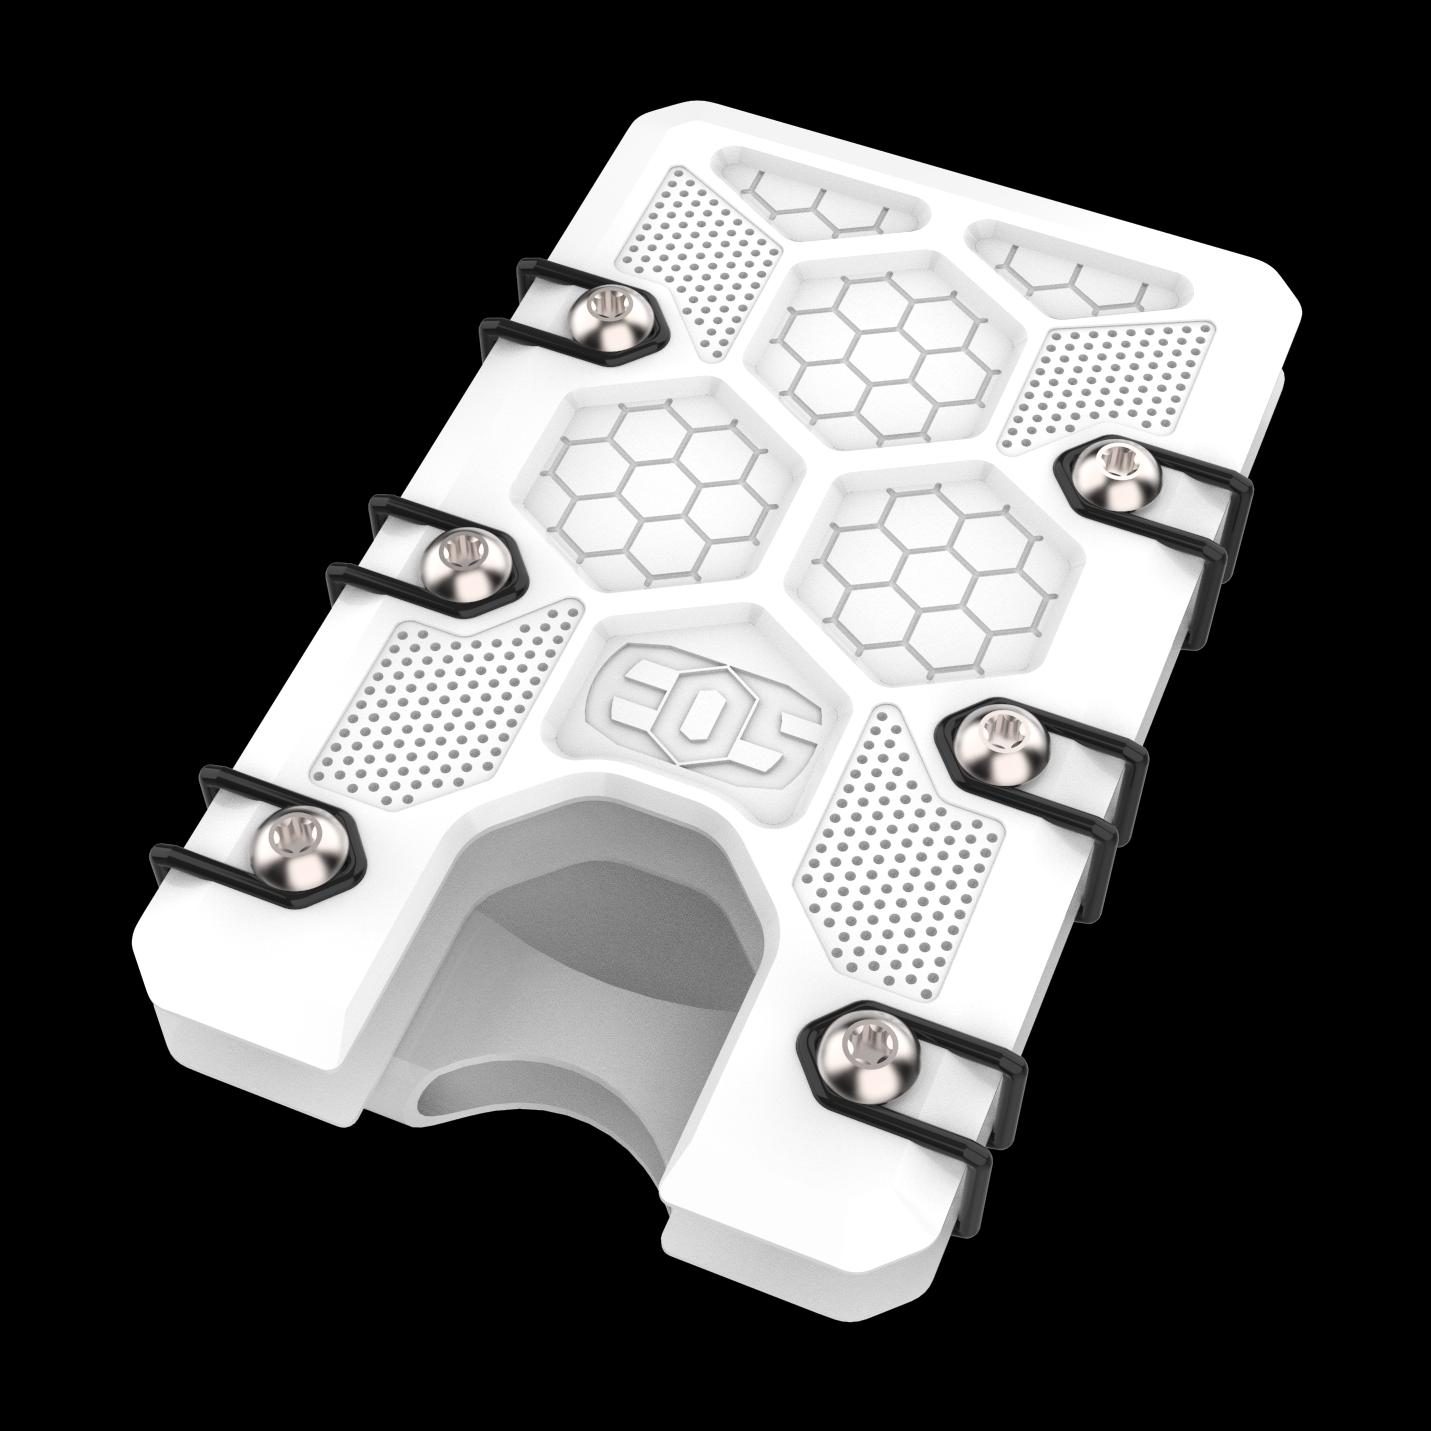 2.5 Titanium Wallet White Cerakote with deep carry clip